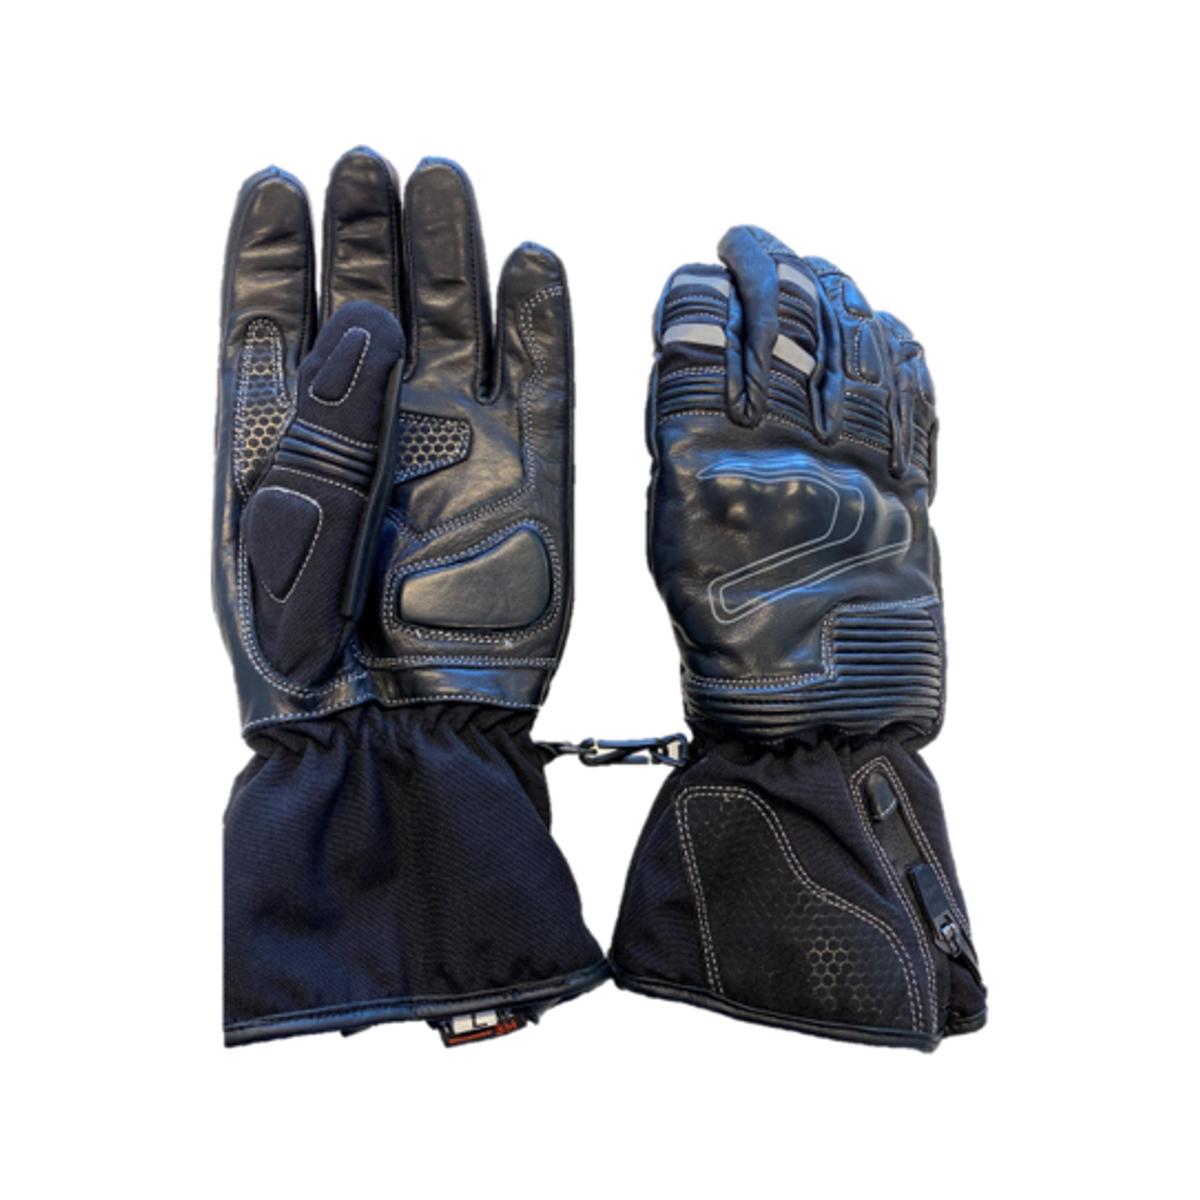 Winter Pro hansker